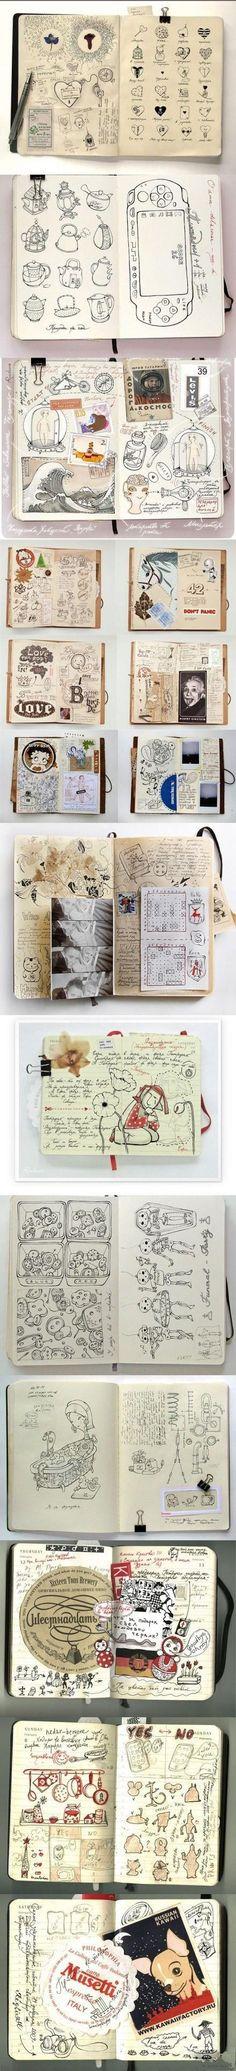 An Ukraine artist's creative book